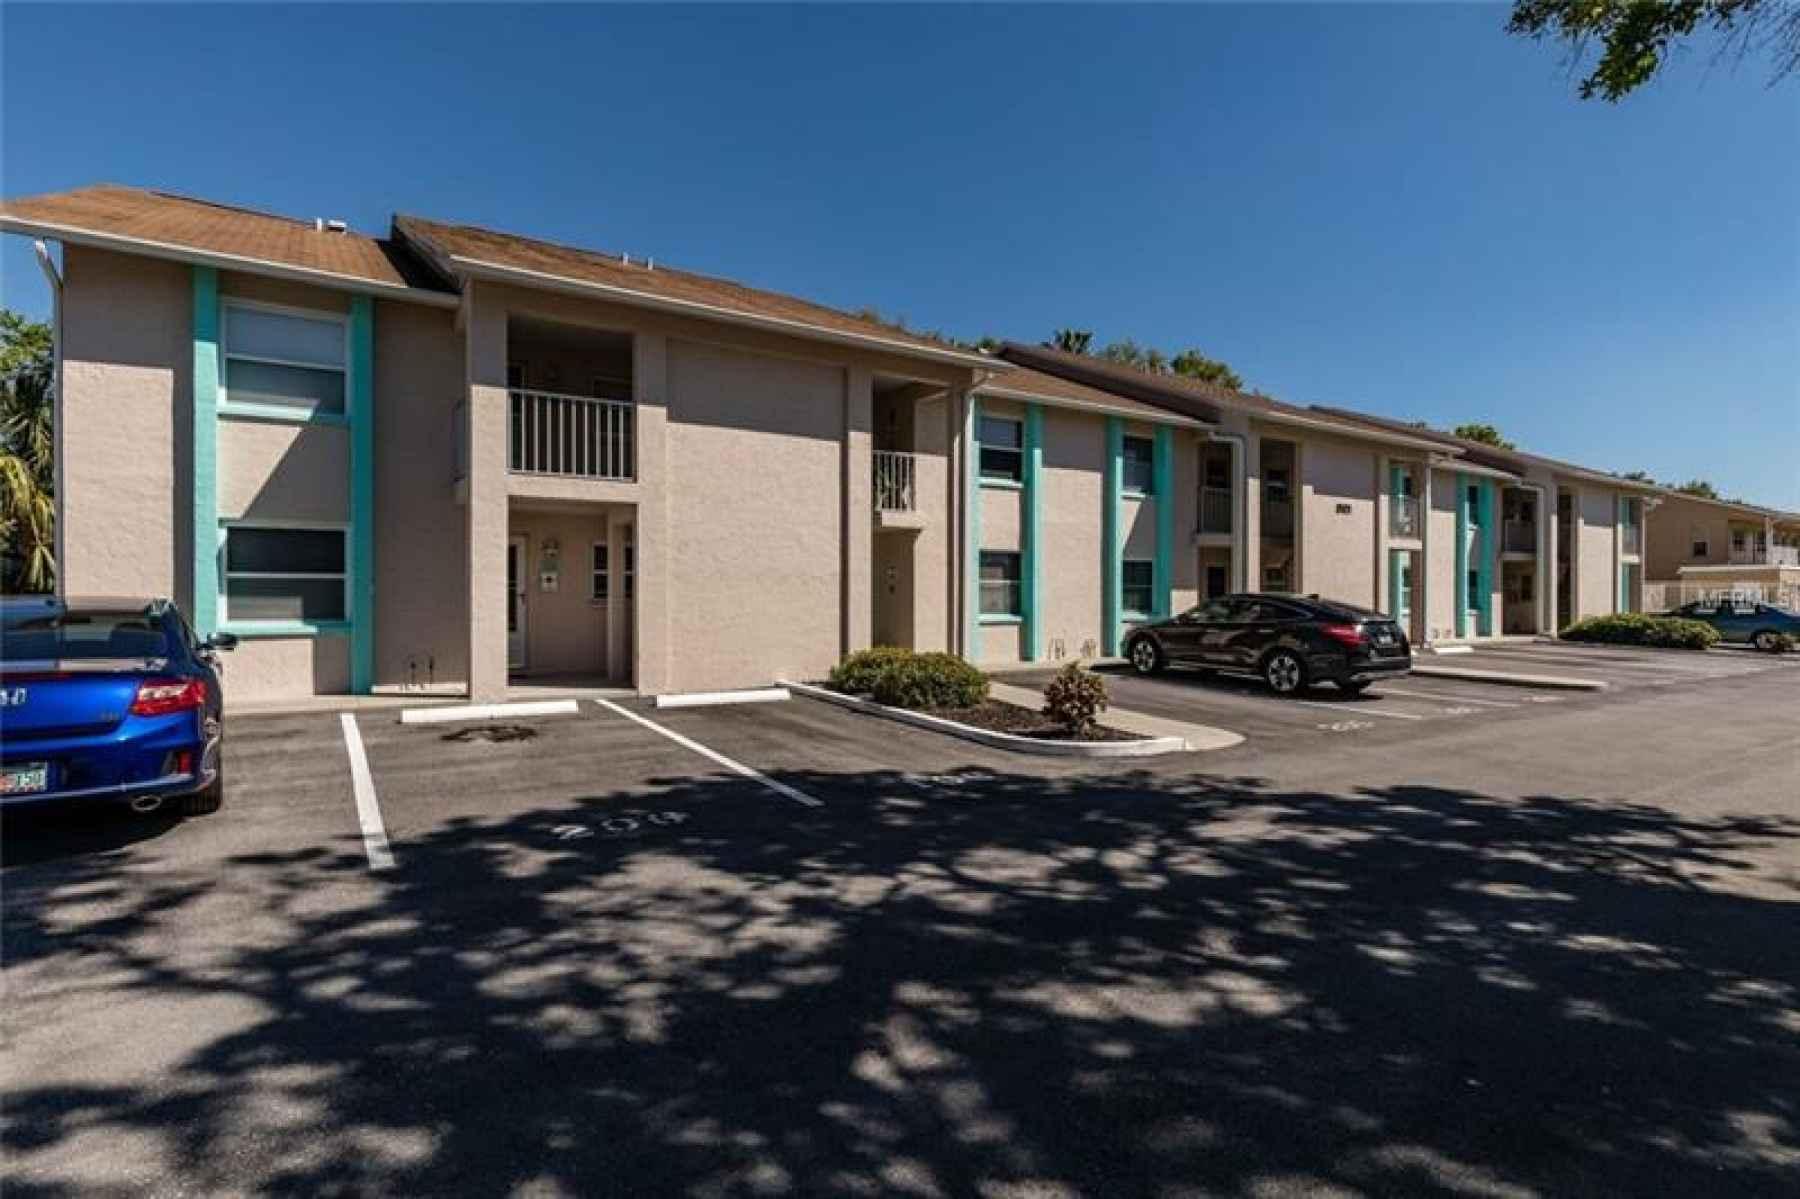 8101 Heatherwood Drive 106 Seminole Fl 33777 Elbert